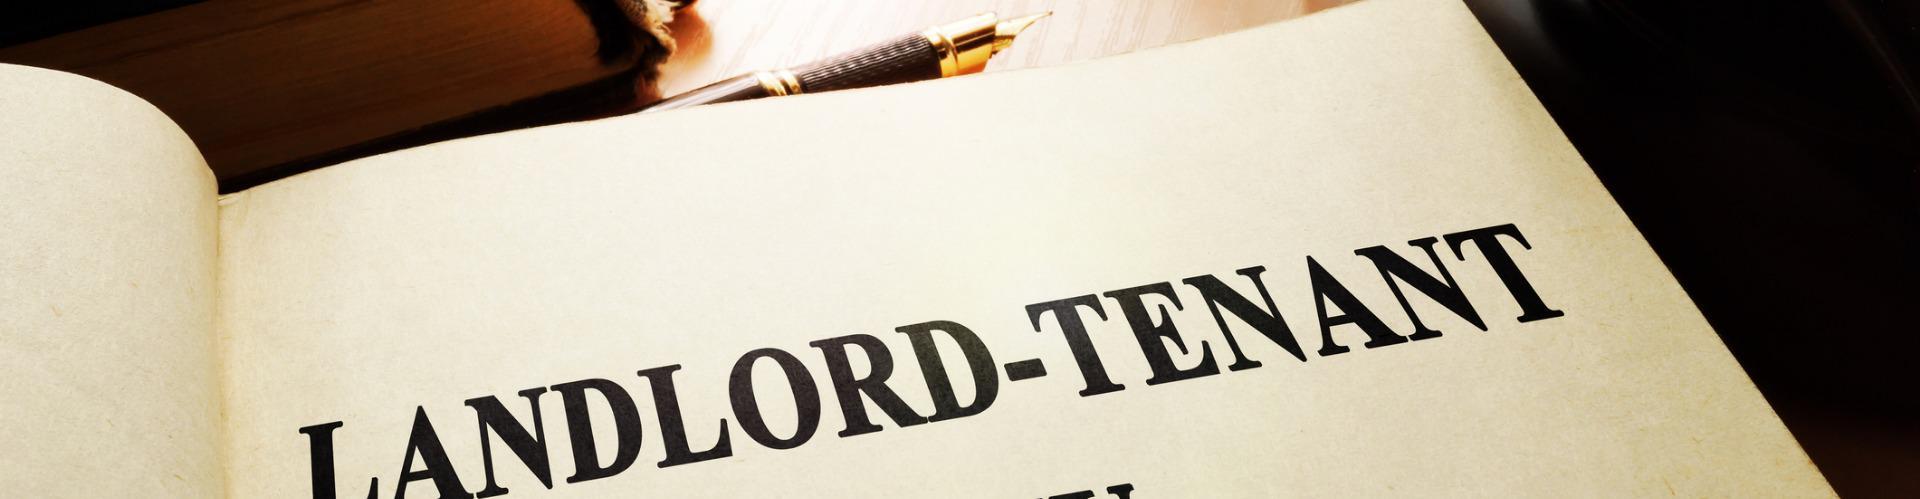 Georgia Landlord-Tenant Handbook